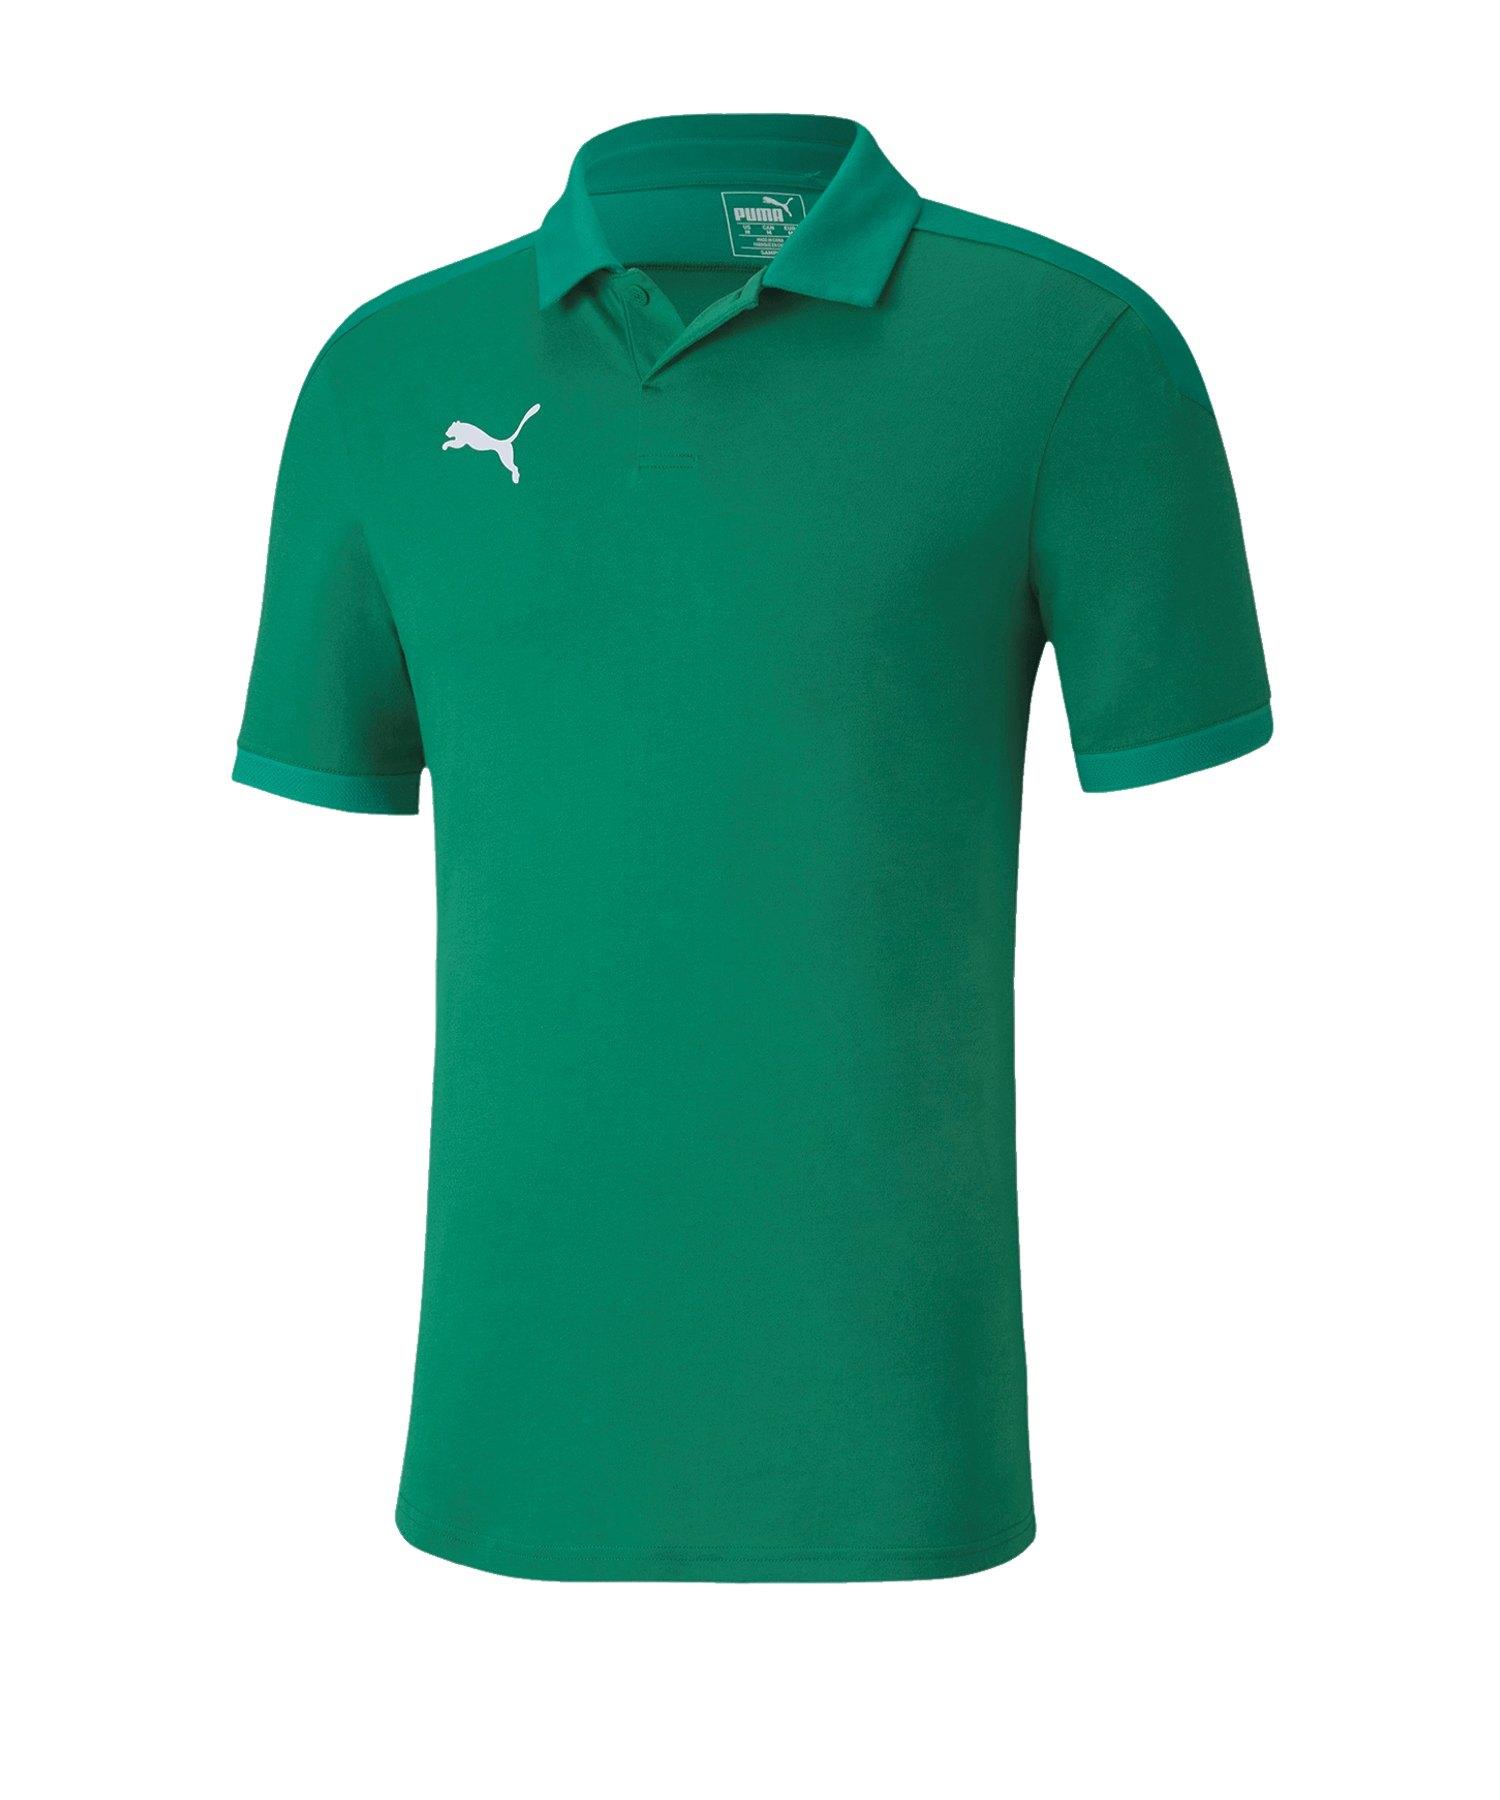 PUMA teamFINAL 21 Sideline Poloshirt Grün F05 - Gruen